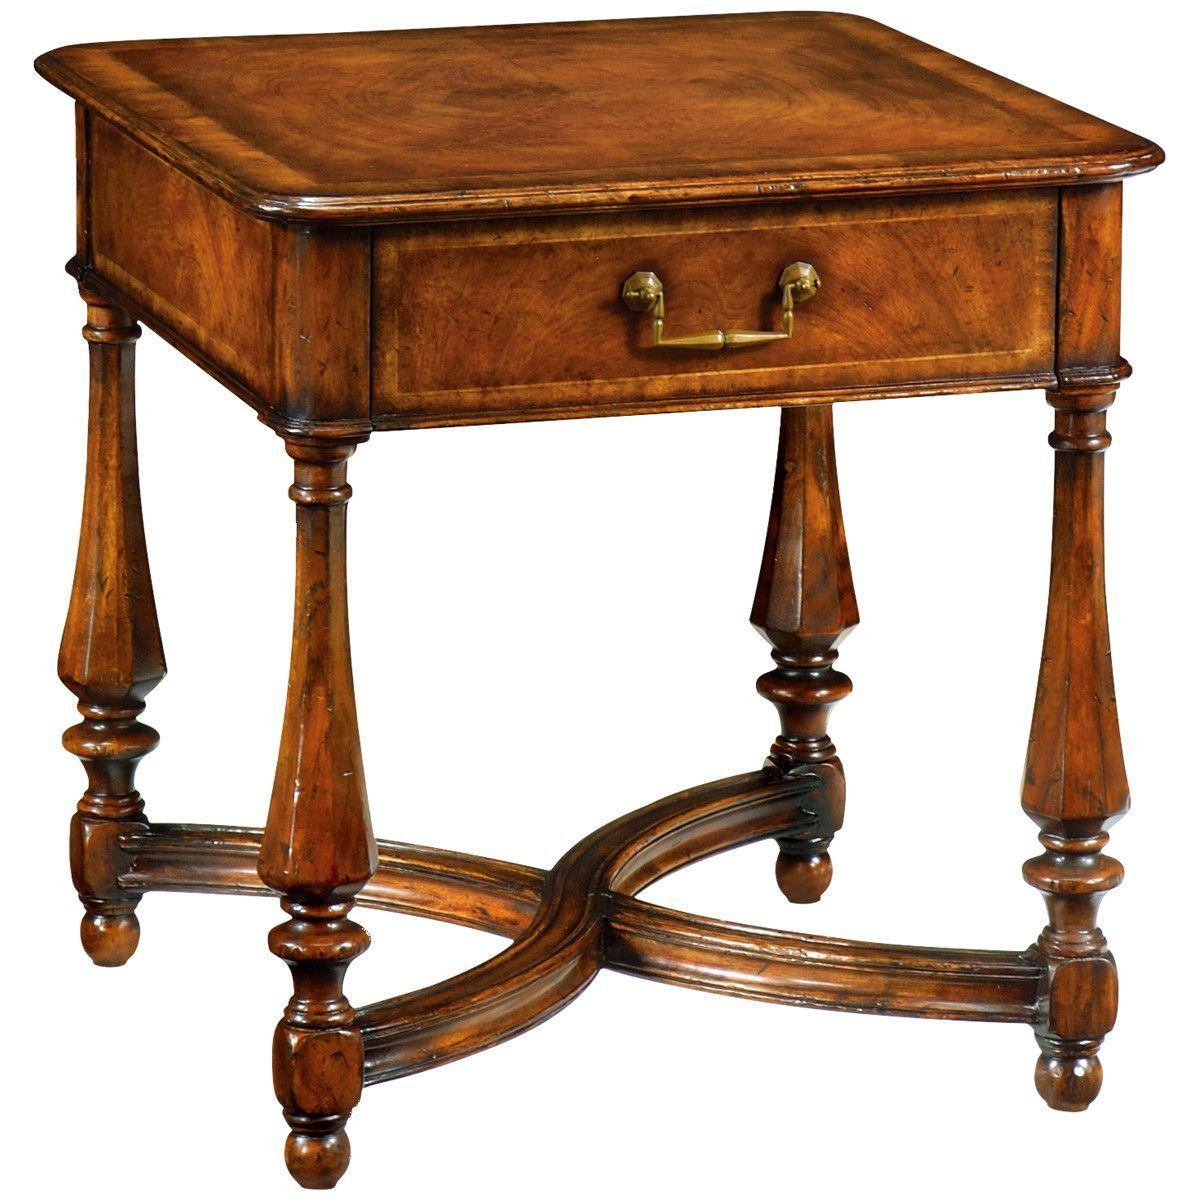 large side table with single drawer decorative walnut veneer